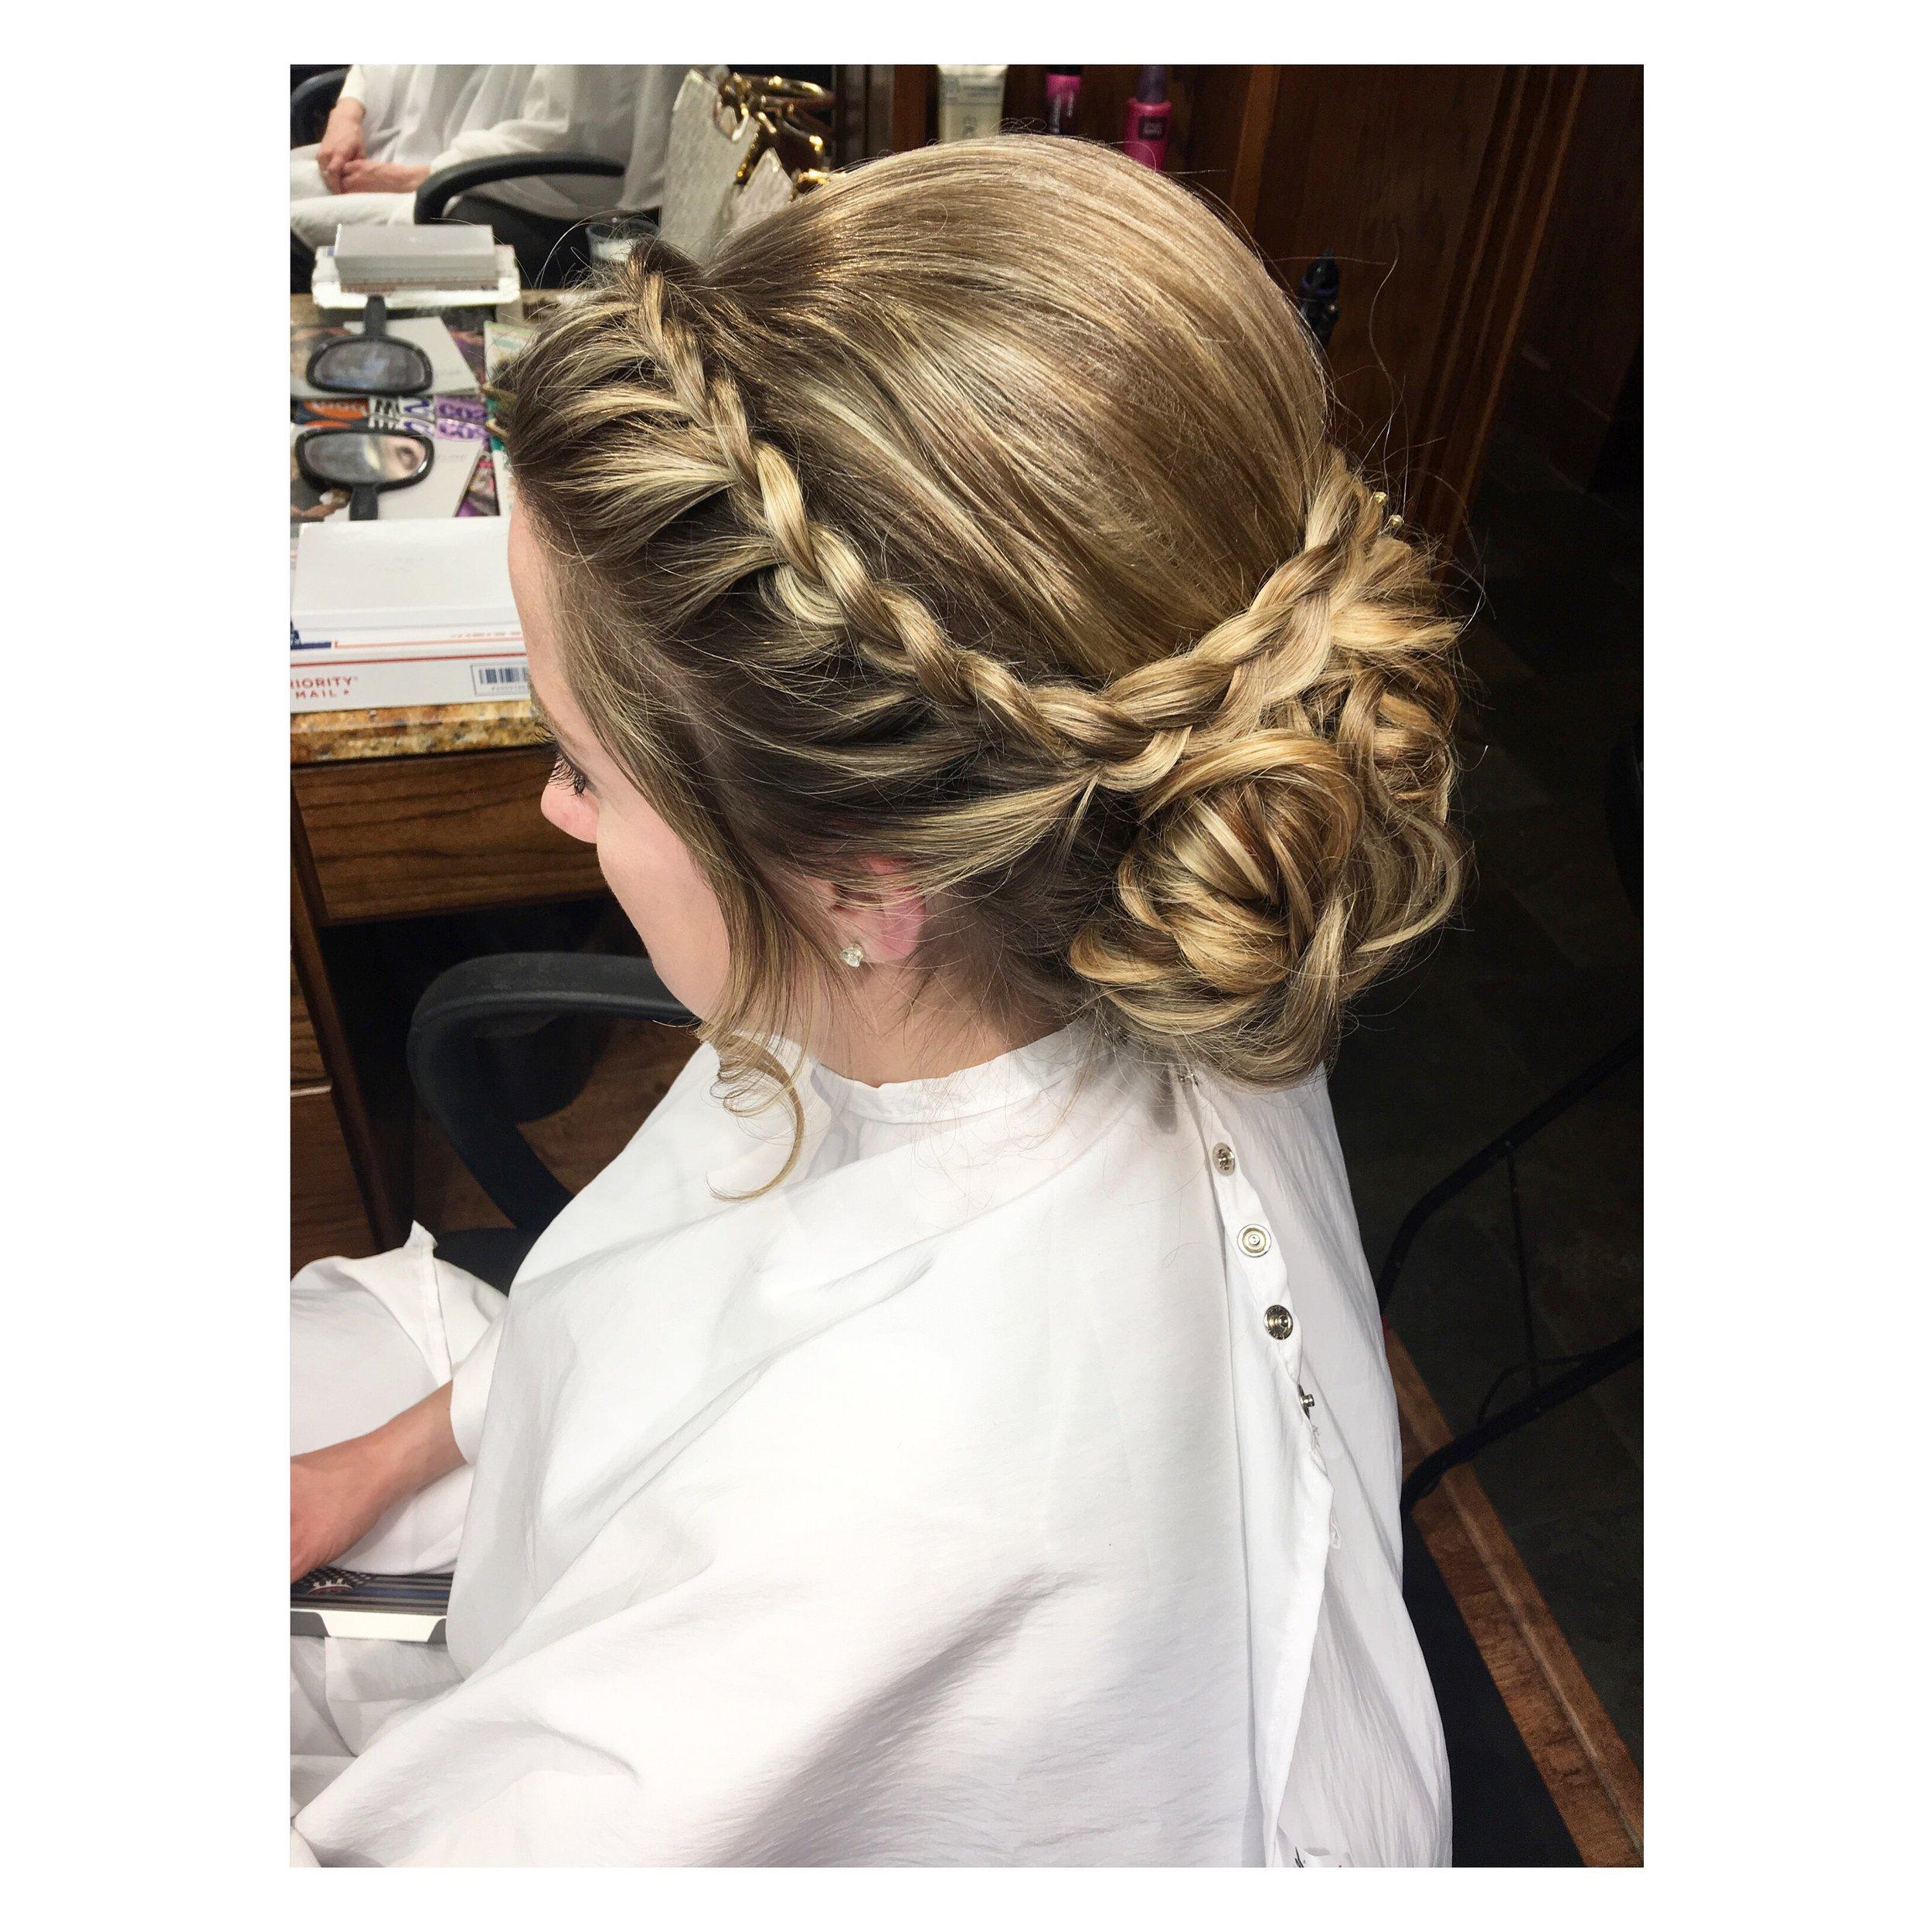 Denver-wedding-hairstylist-Colorado-wedding-hair-braiding-specialist